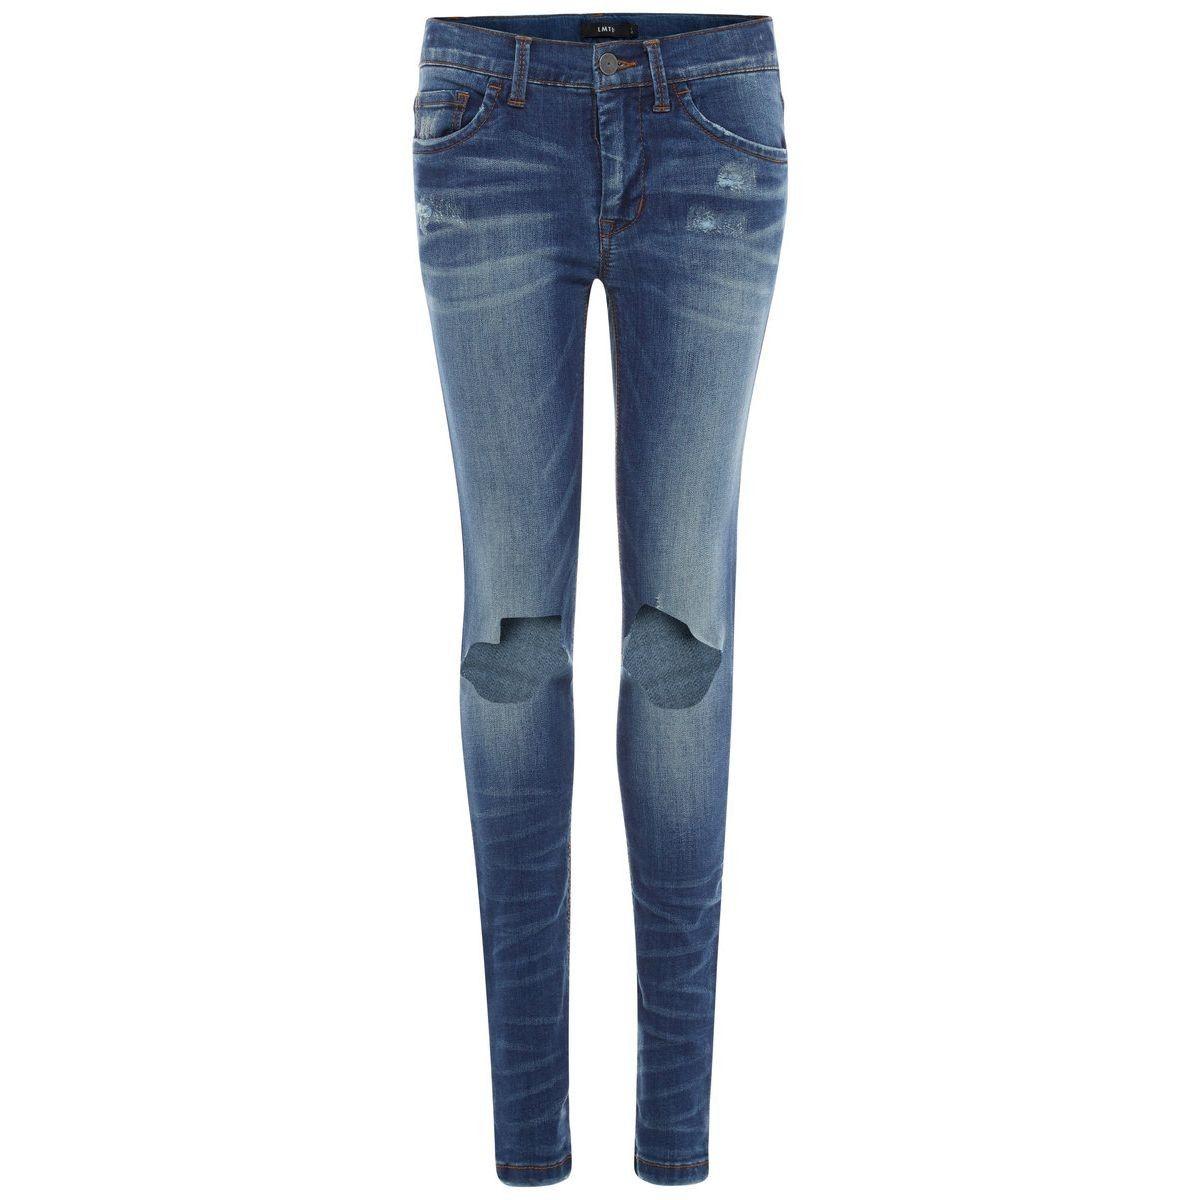 Jean Coupe Garçons SkinnyProducts Jeans GarconSkinny QCsdxhtr